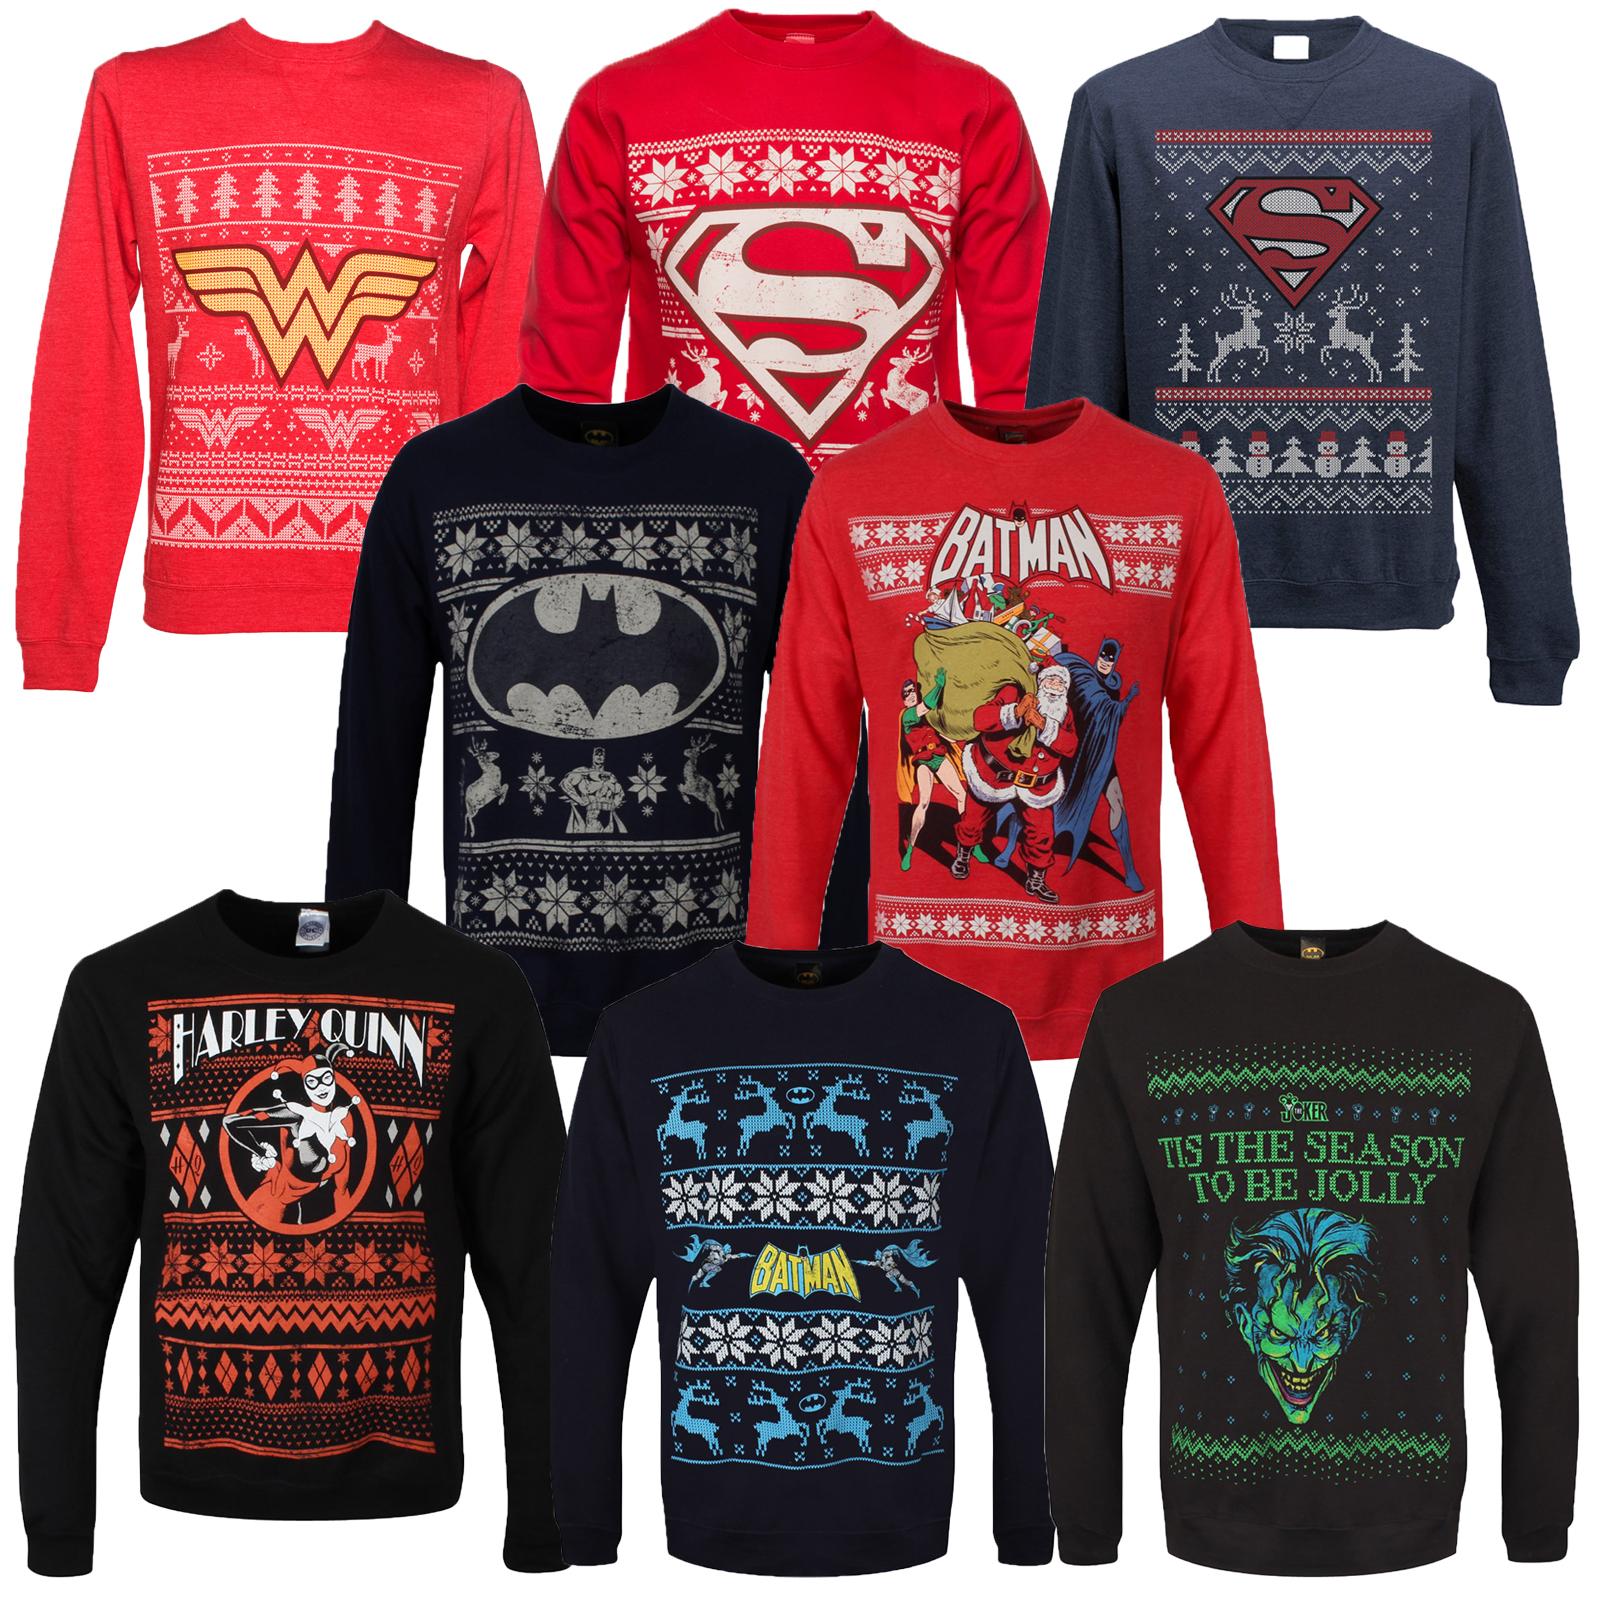 Adults Dc Comics Superhero Theme Christmas Jumpers New